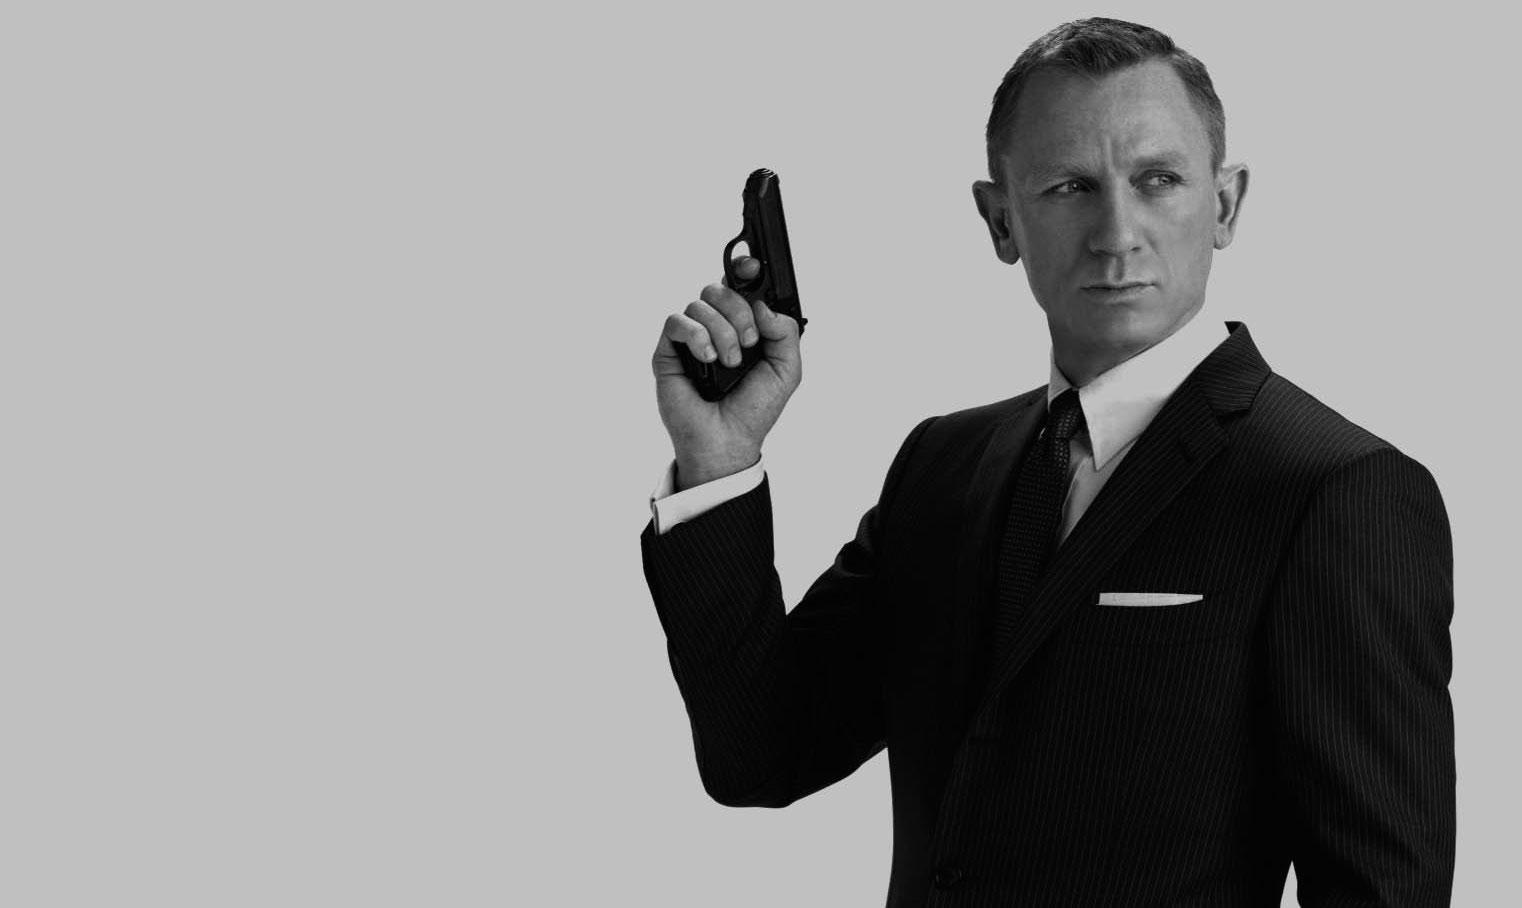 https://cinemaplanet.pt/wp-content/uploads/2017/08/Daniel-Craig-James-Bond.jpg